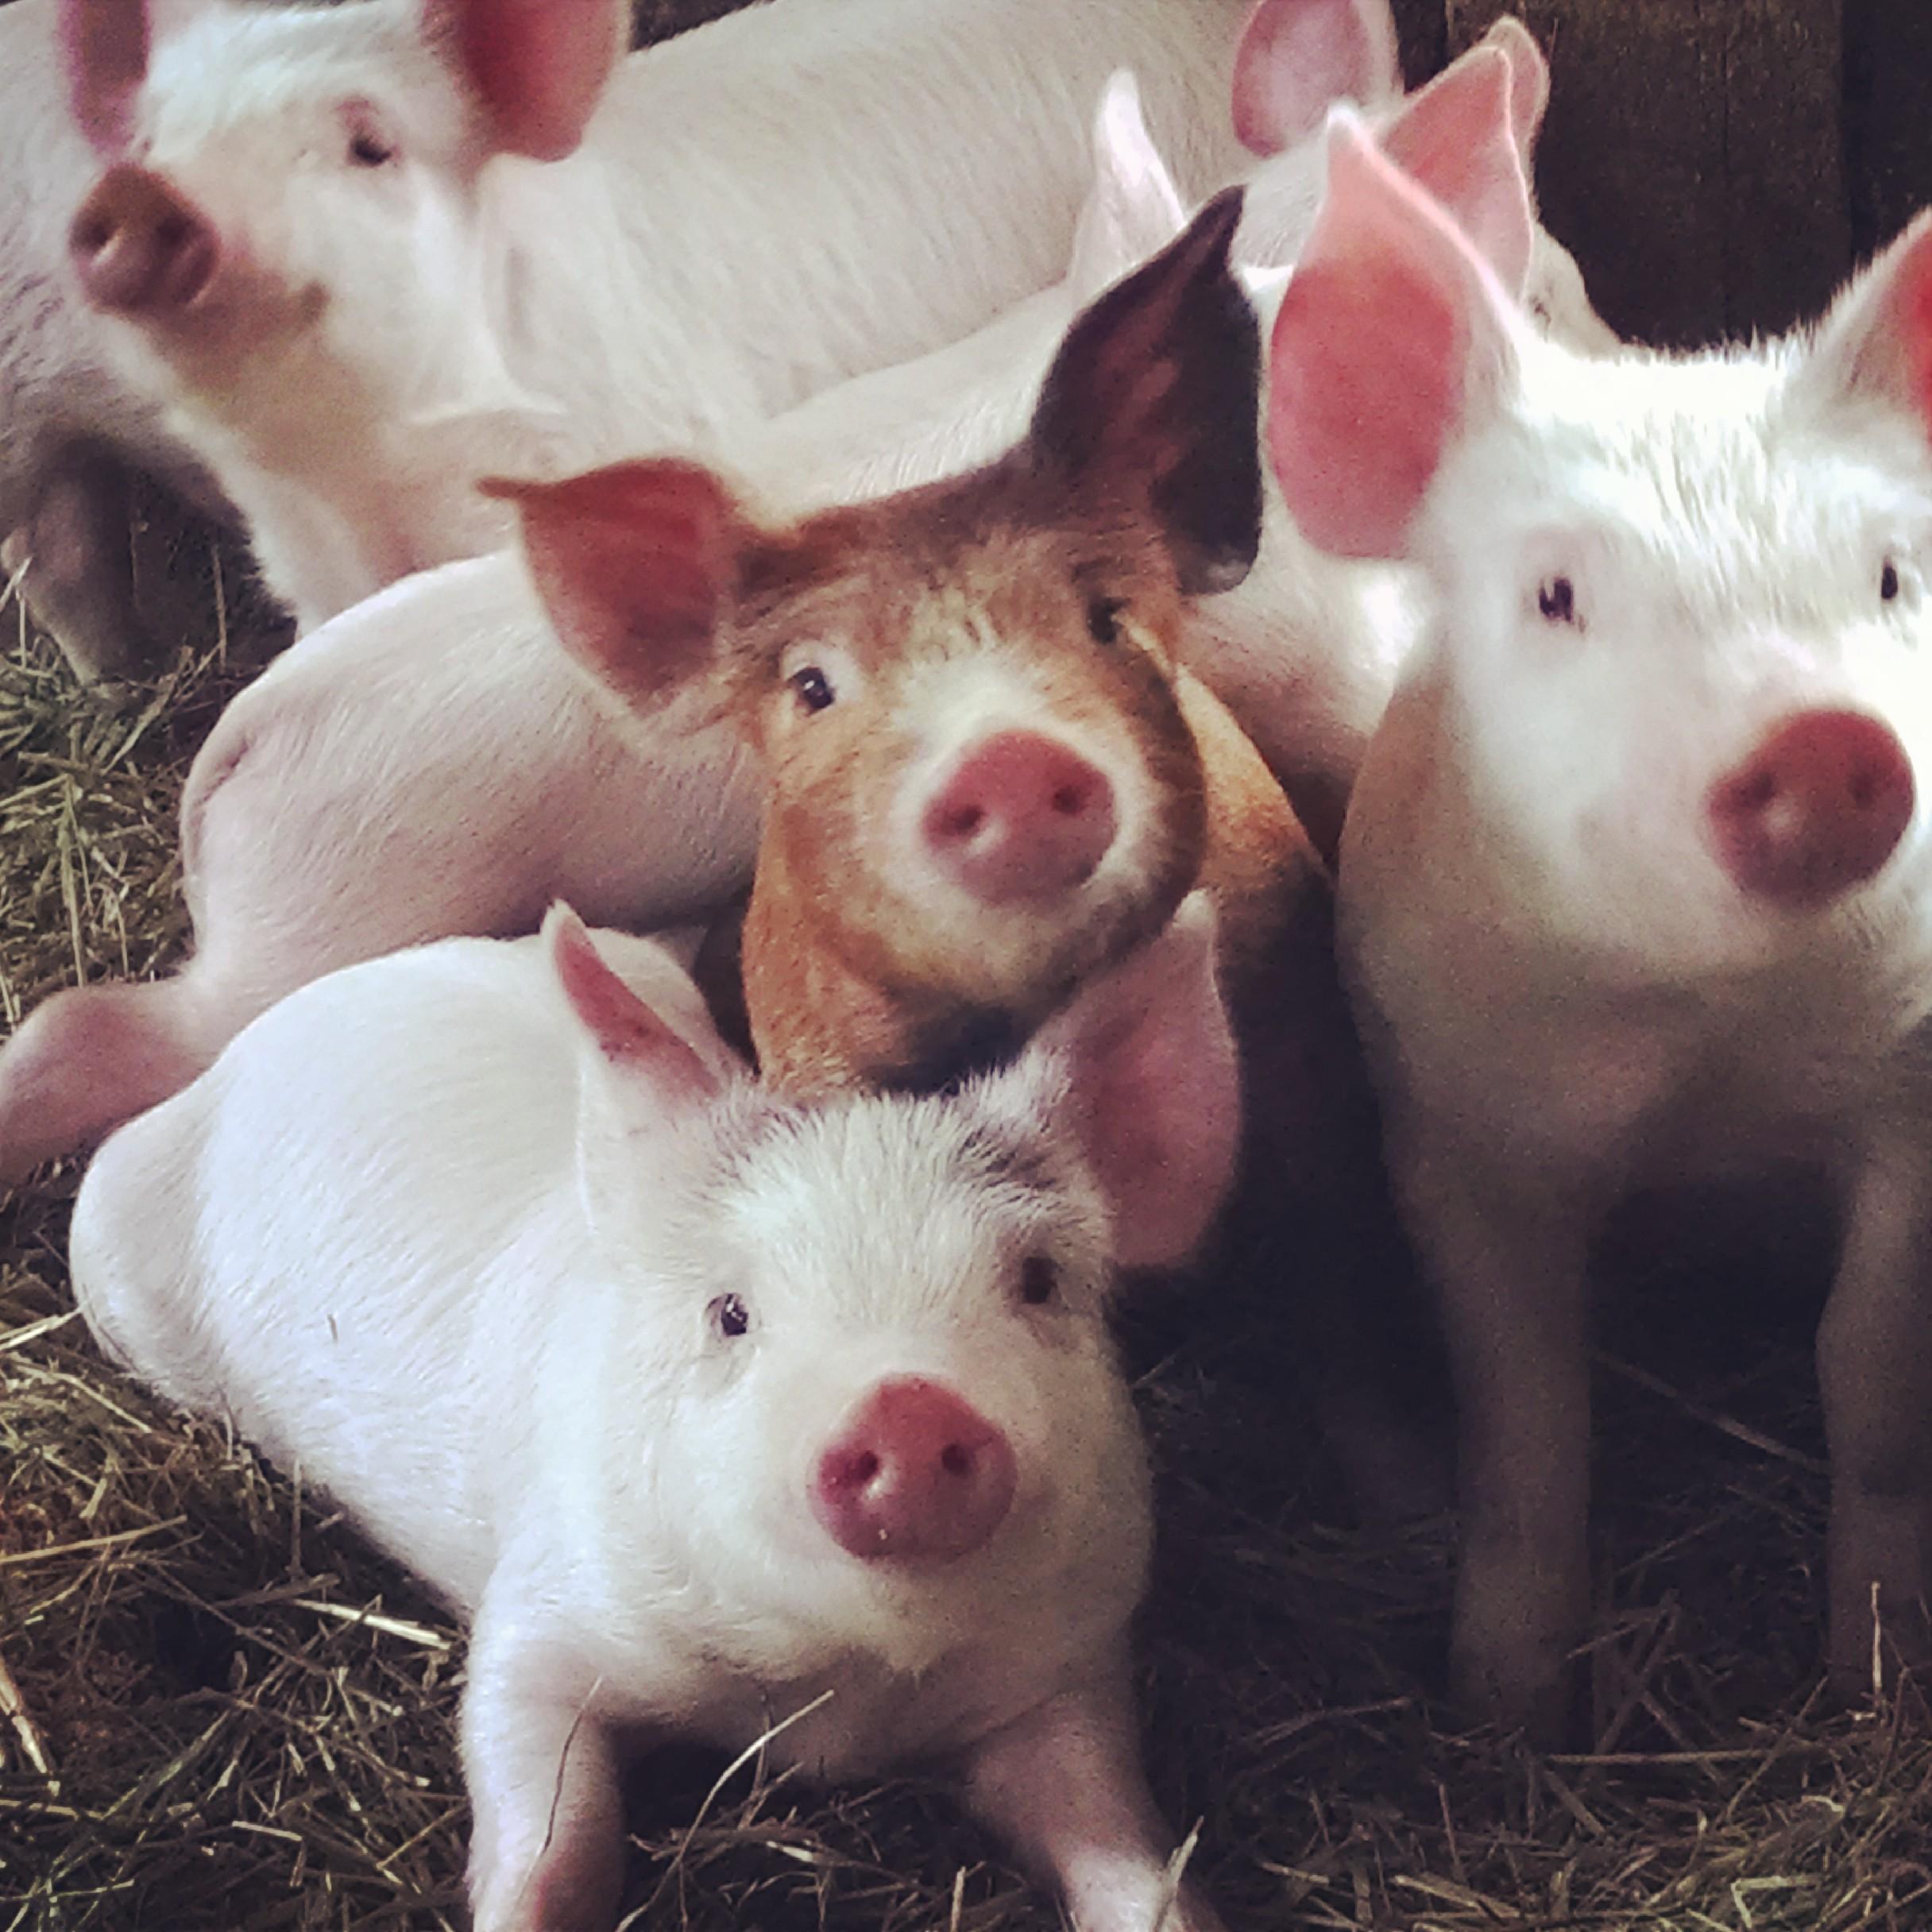 The Farm's Piglets